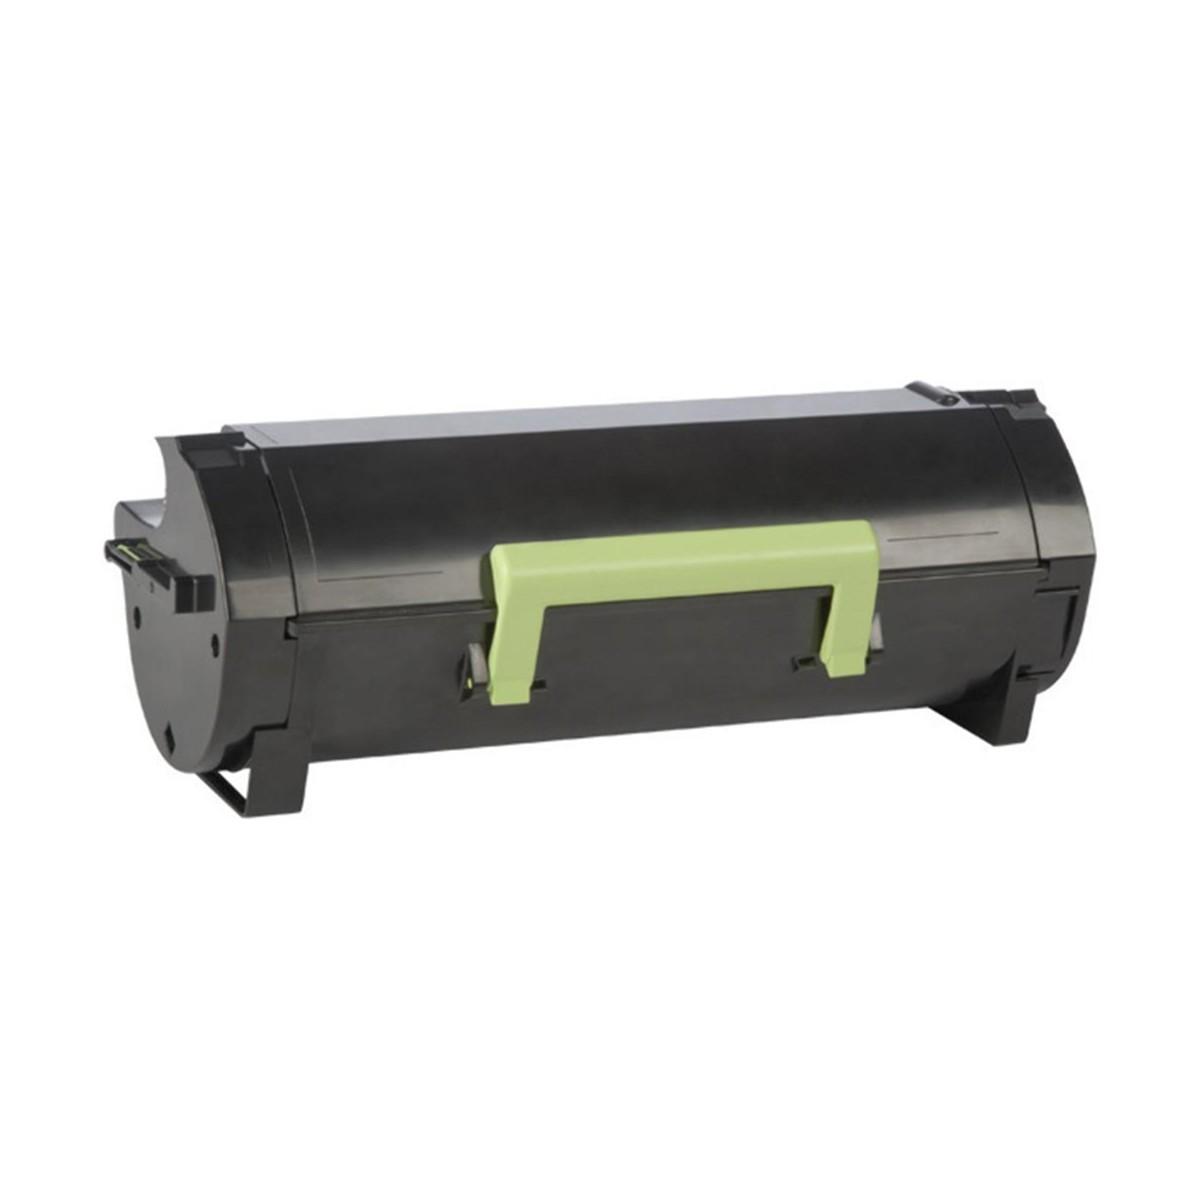 Compativel: Toner novasupri 604H Lexmark 60FBH00 60BH 60F4H00 MX310 MX410 MX510 MX610 MS310 MS410 MS510 10k